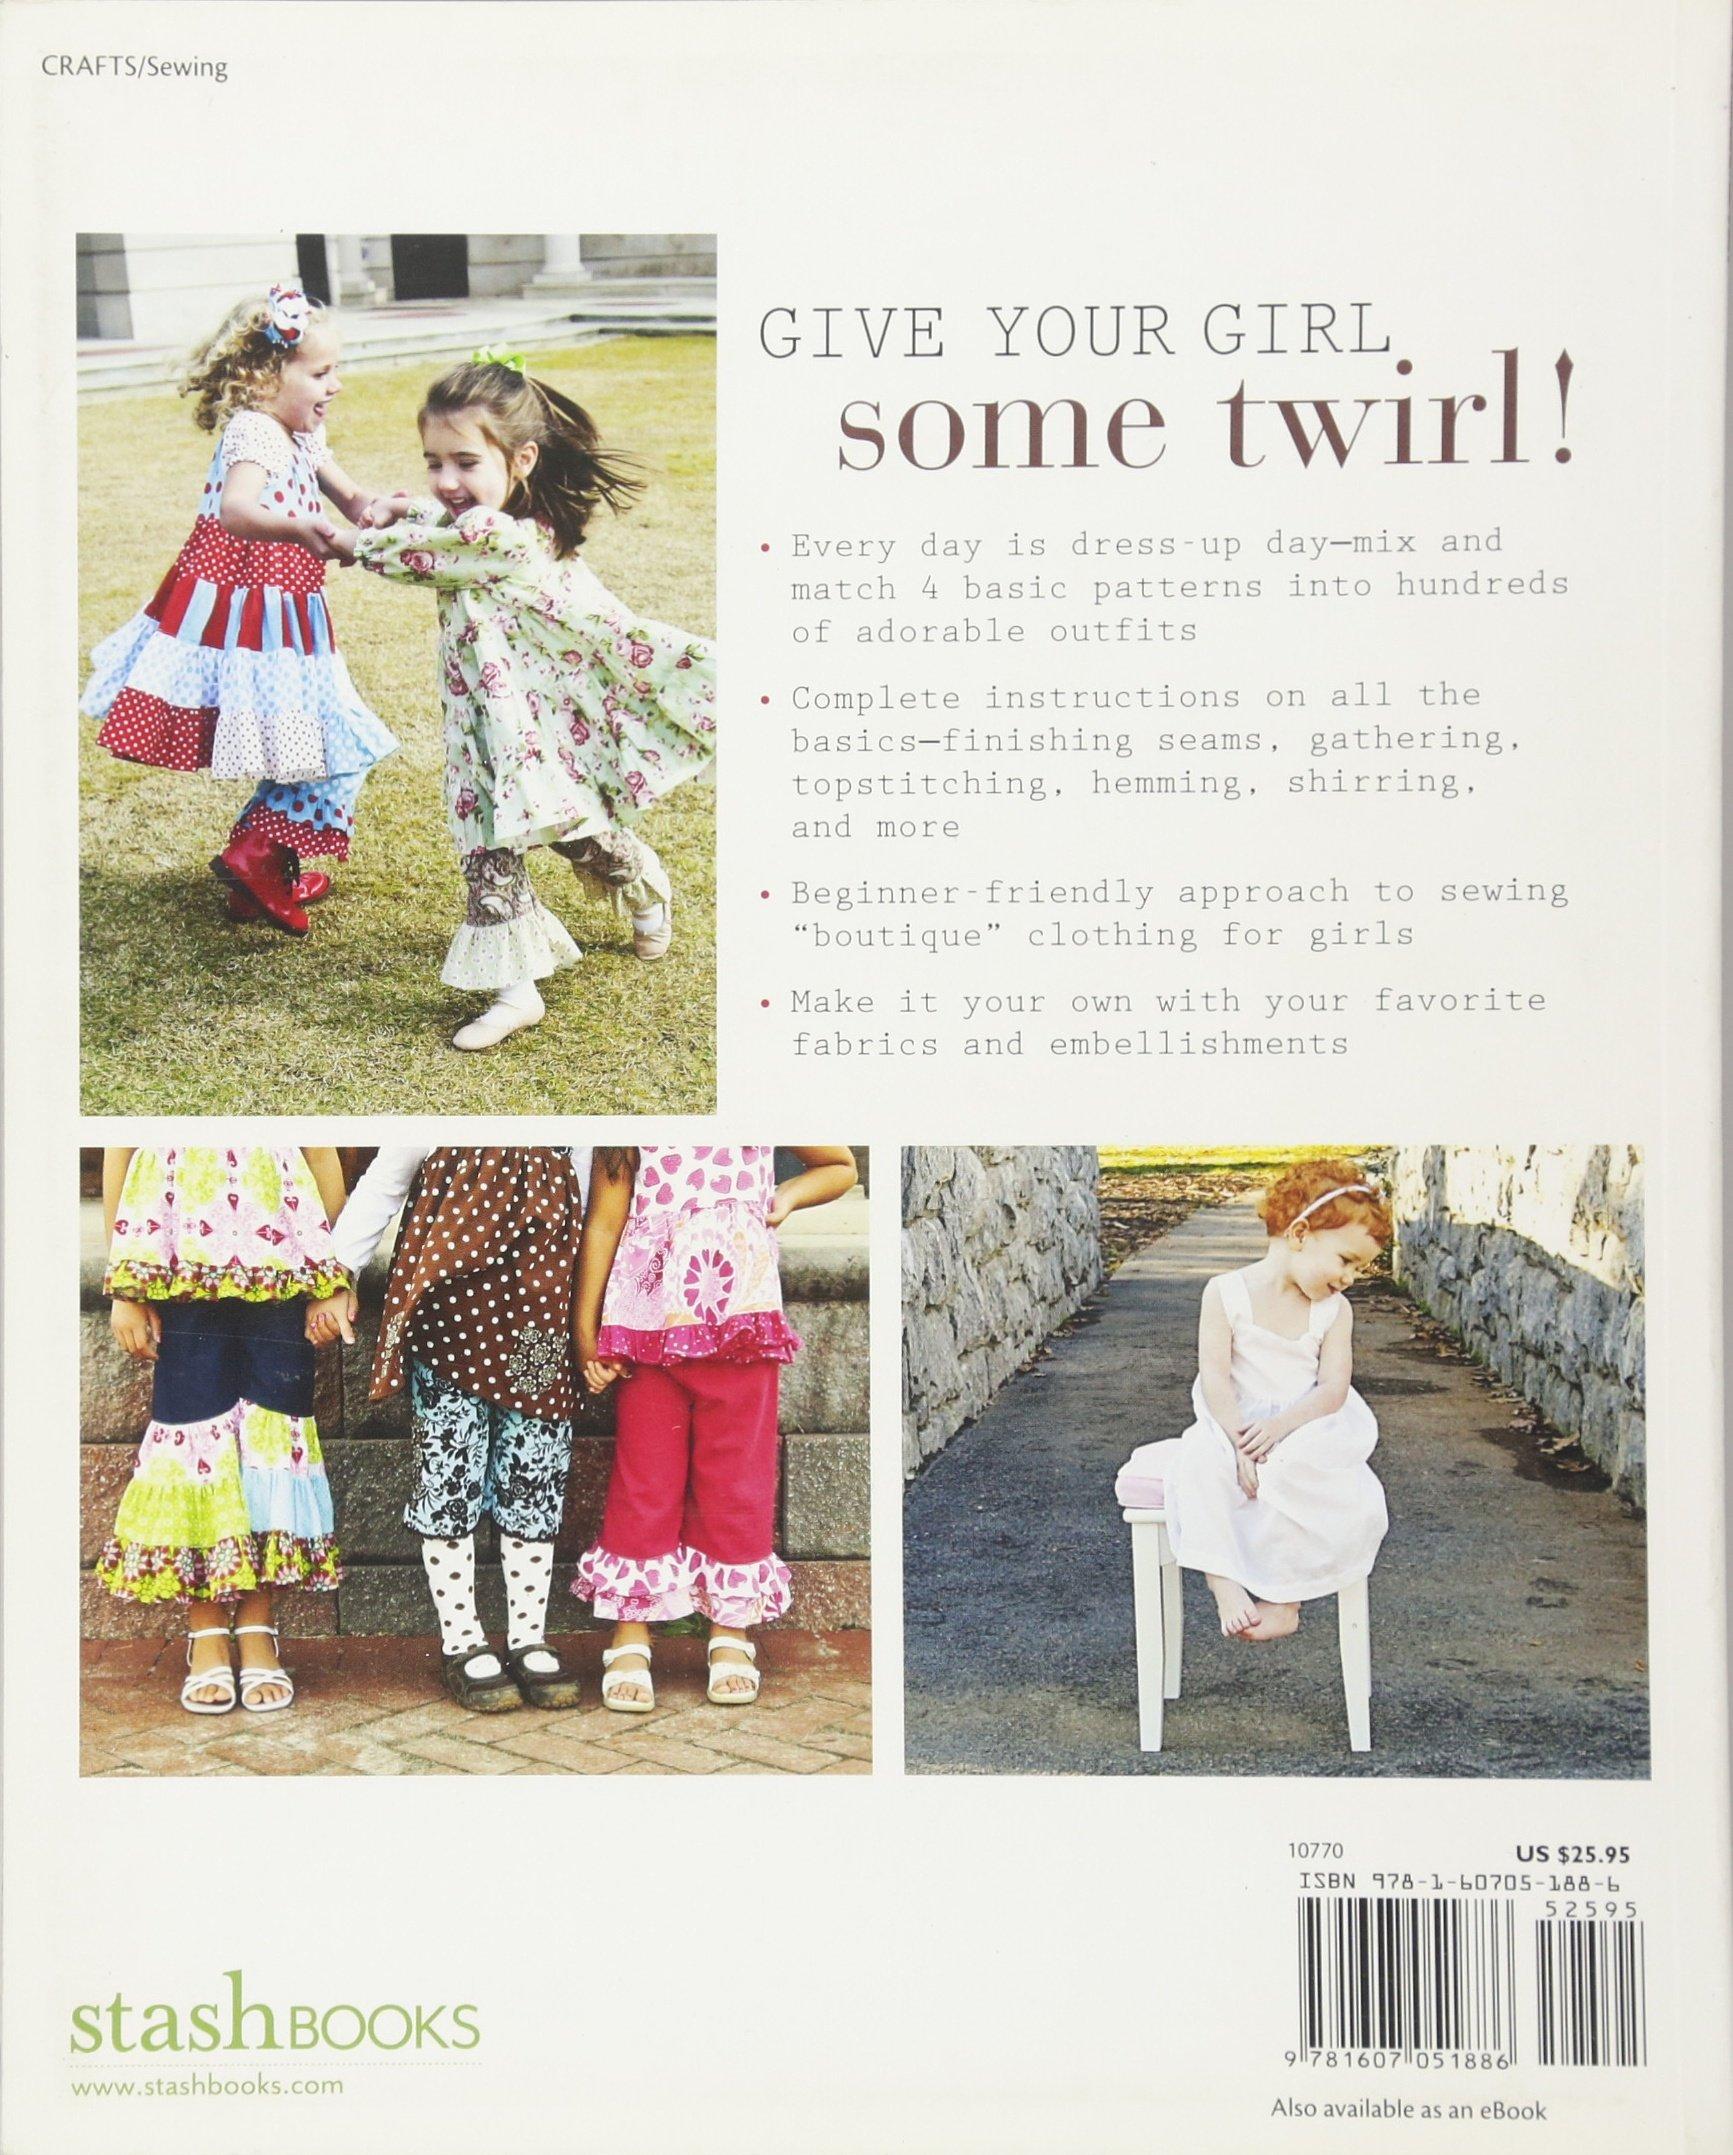 Amazon little girls big style sew a boutique wardrobe from amazon little girls big style sew a boutique wardrobe from 4 easy patterns 0734817107705 mary abreu books jeuxipadfo Image collections